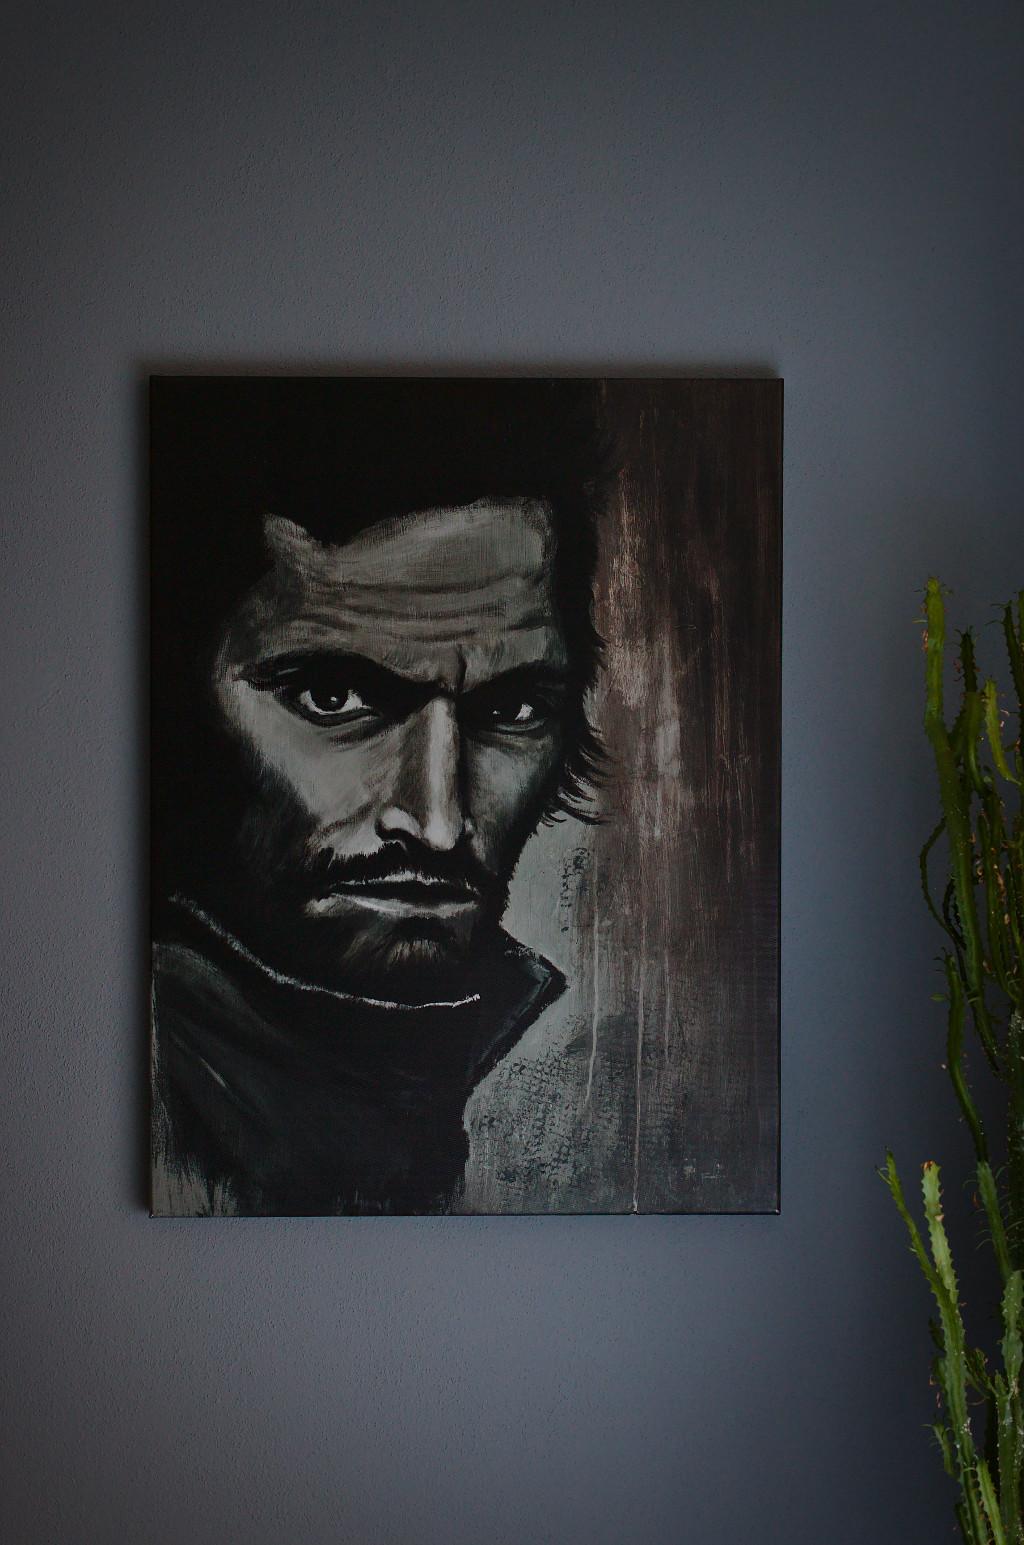 Bild Leonardo Kunstdruck Auf Leinwand Nela S Atelier